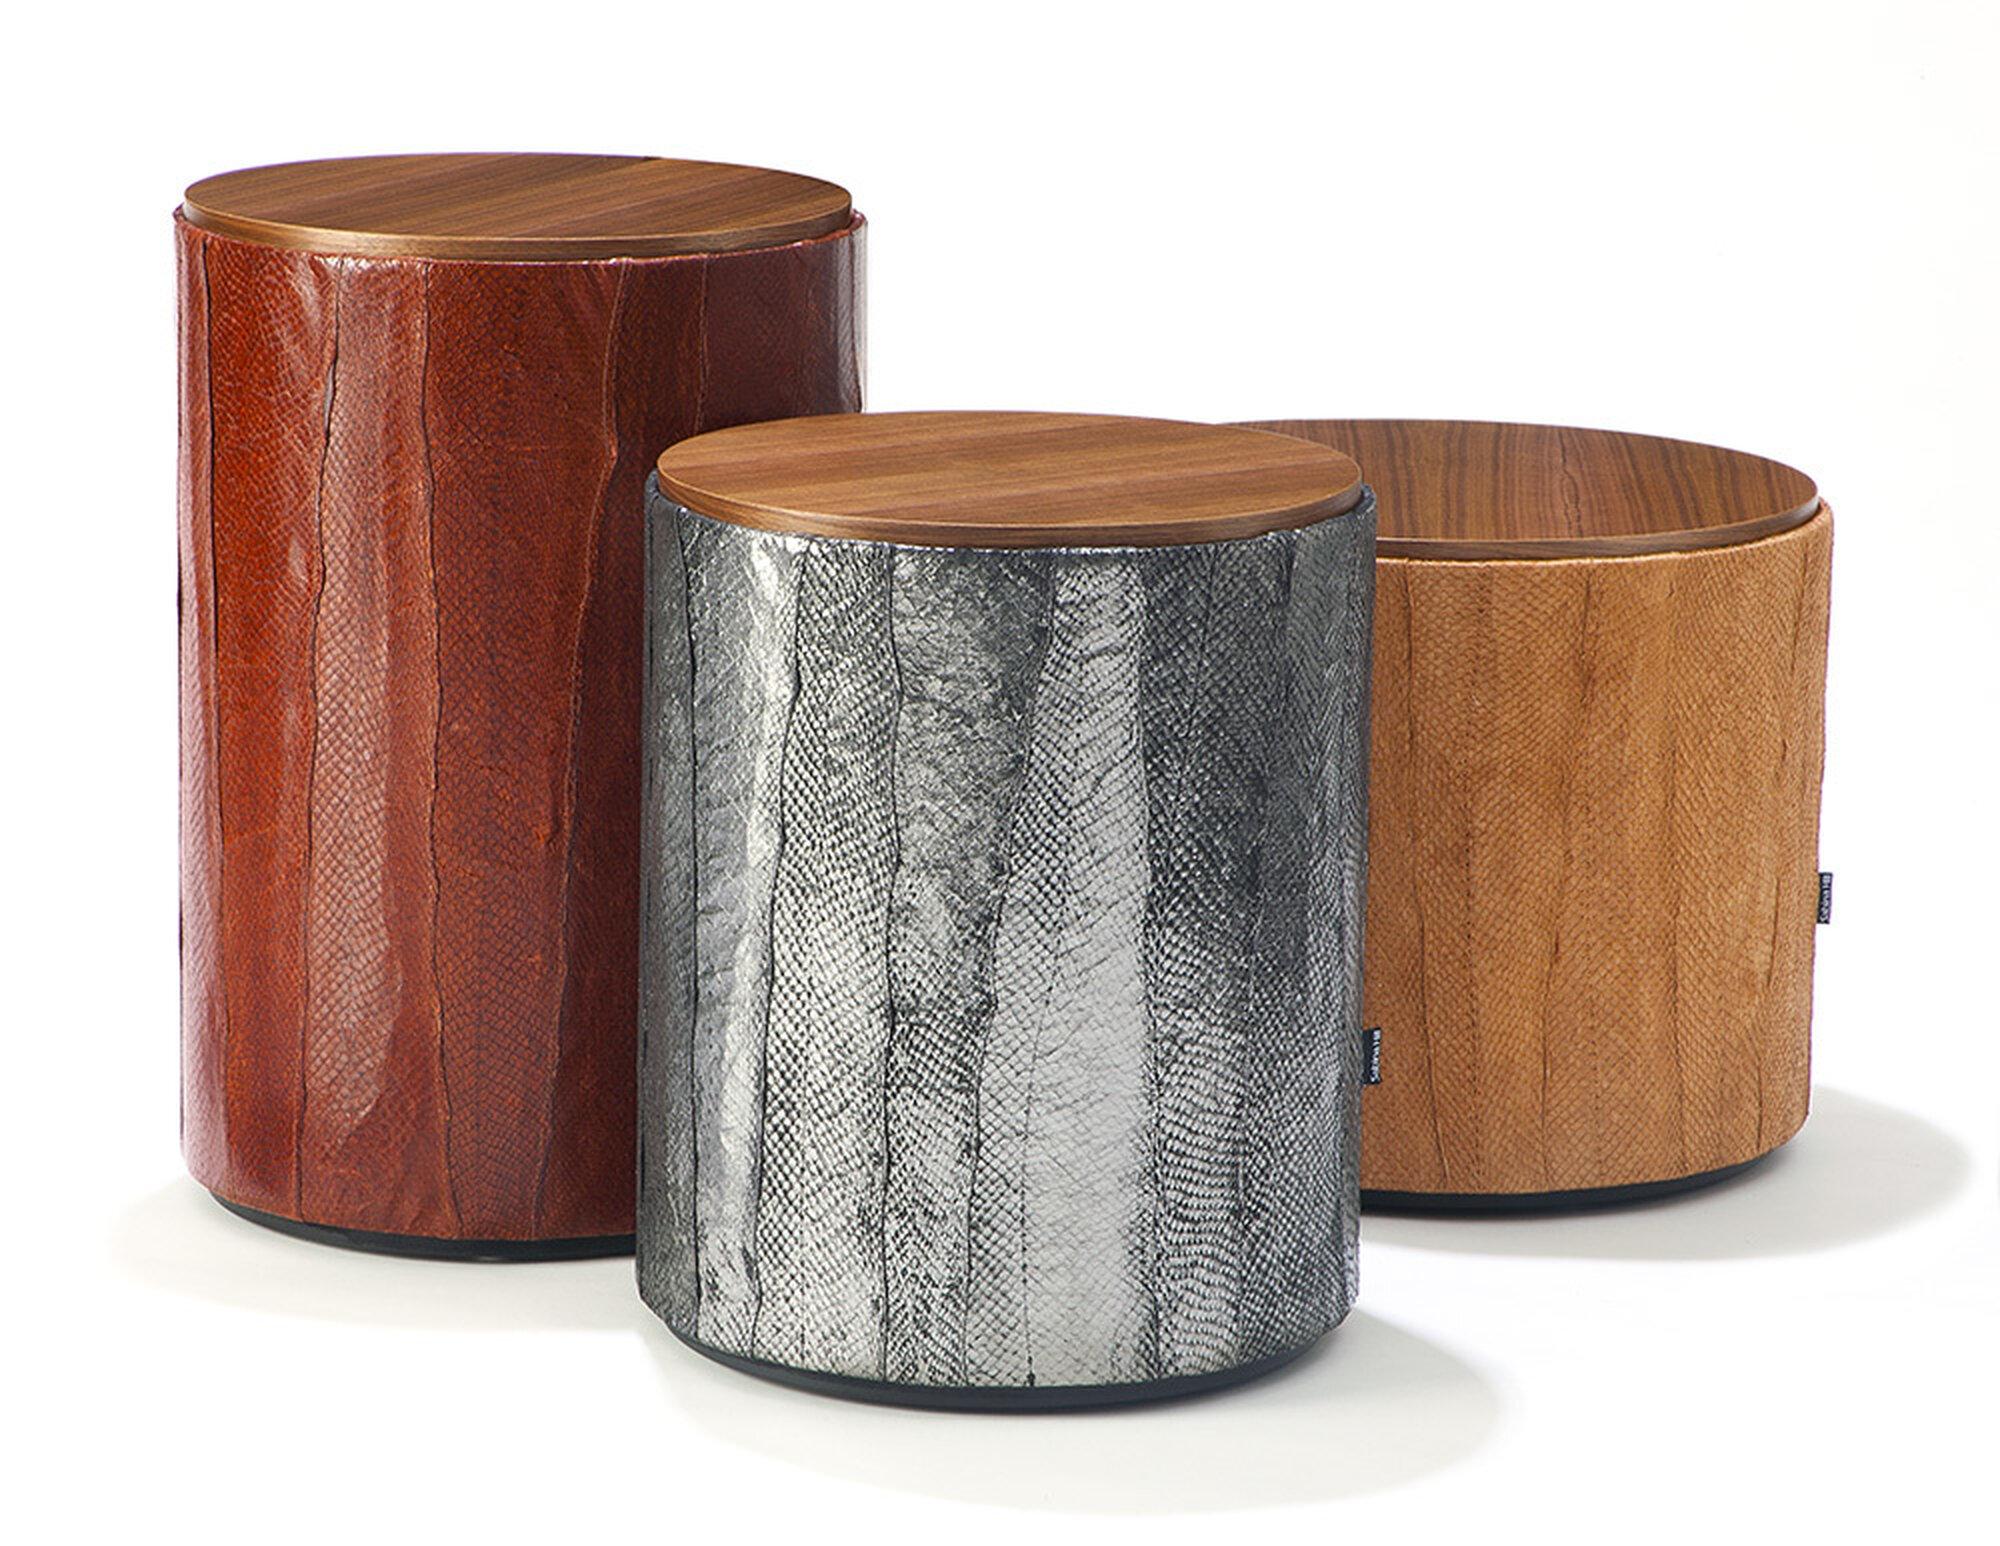 Salmon Drum Tables